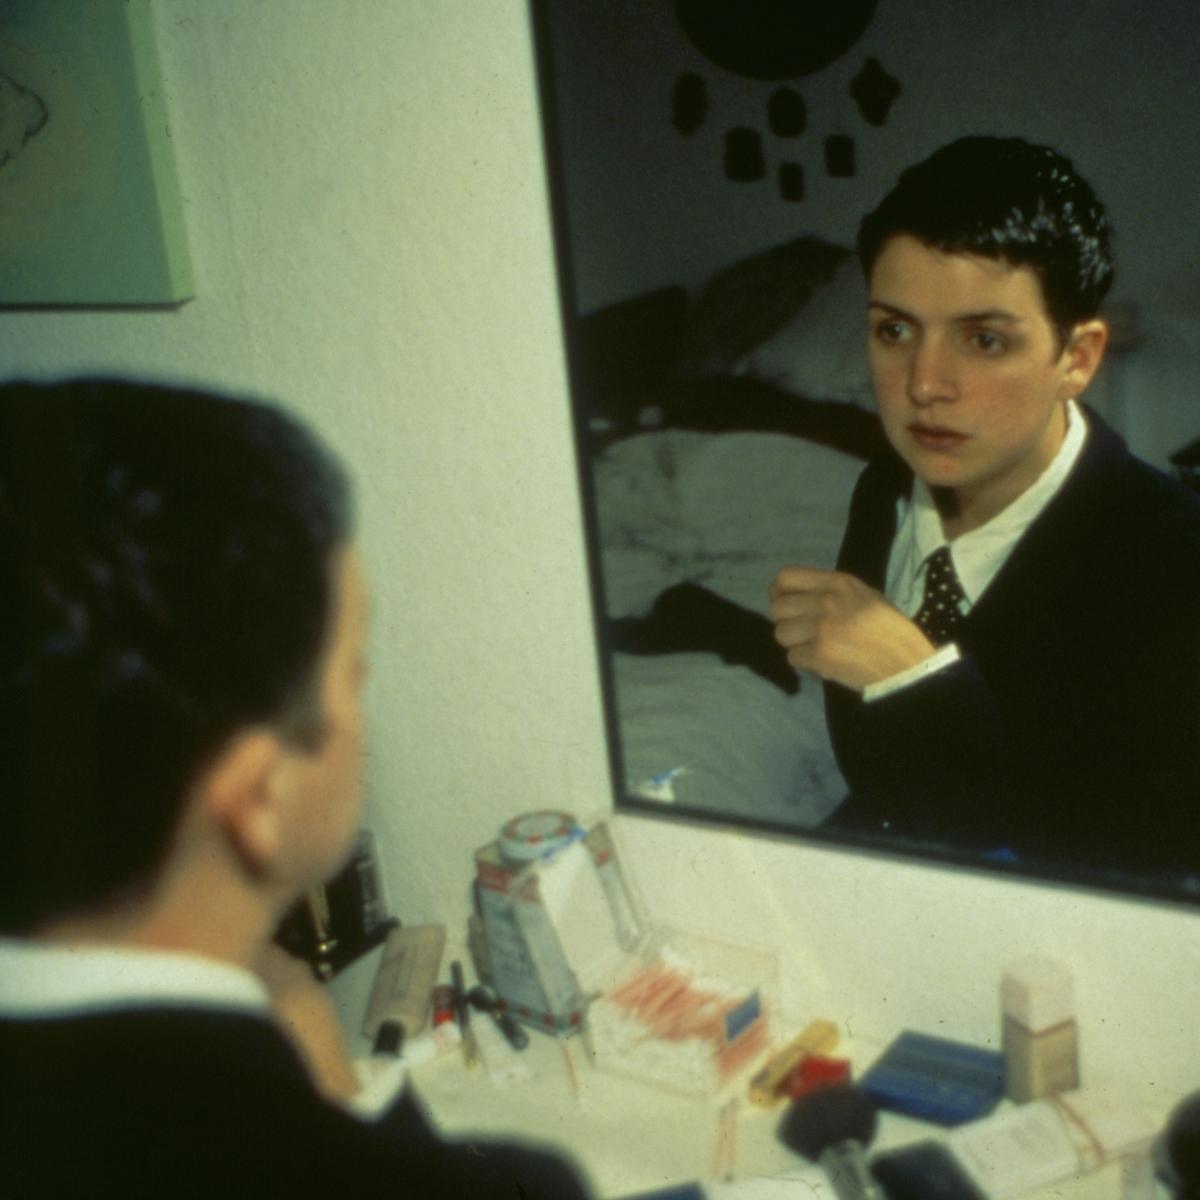 Nan Goldin, Siobhan in my mirror, Berlin, 1992,  Nan Goldin, Courtesy Marian Goodman Gallery